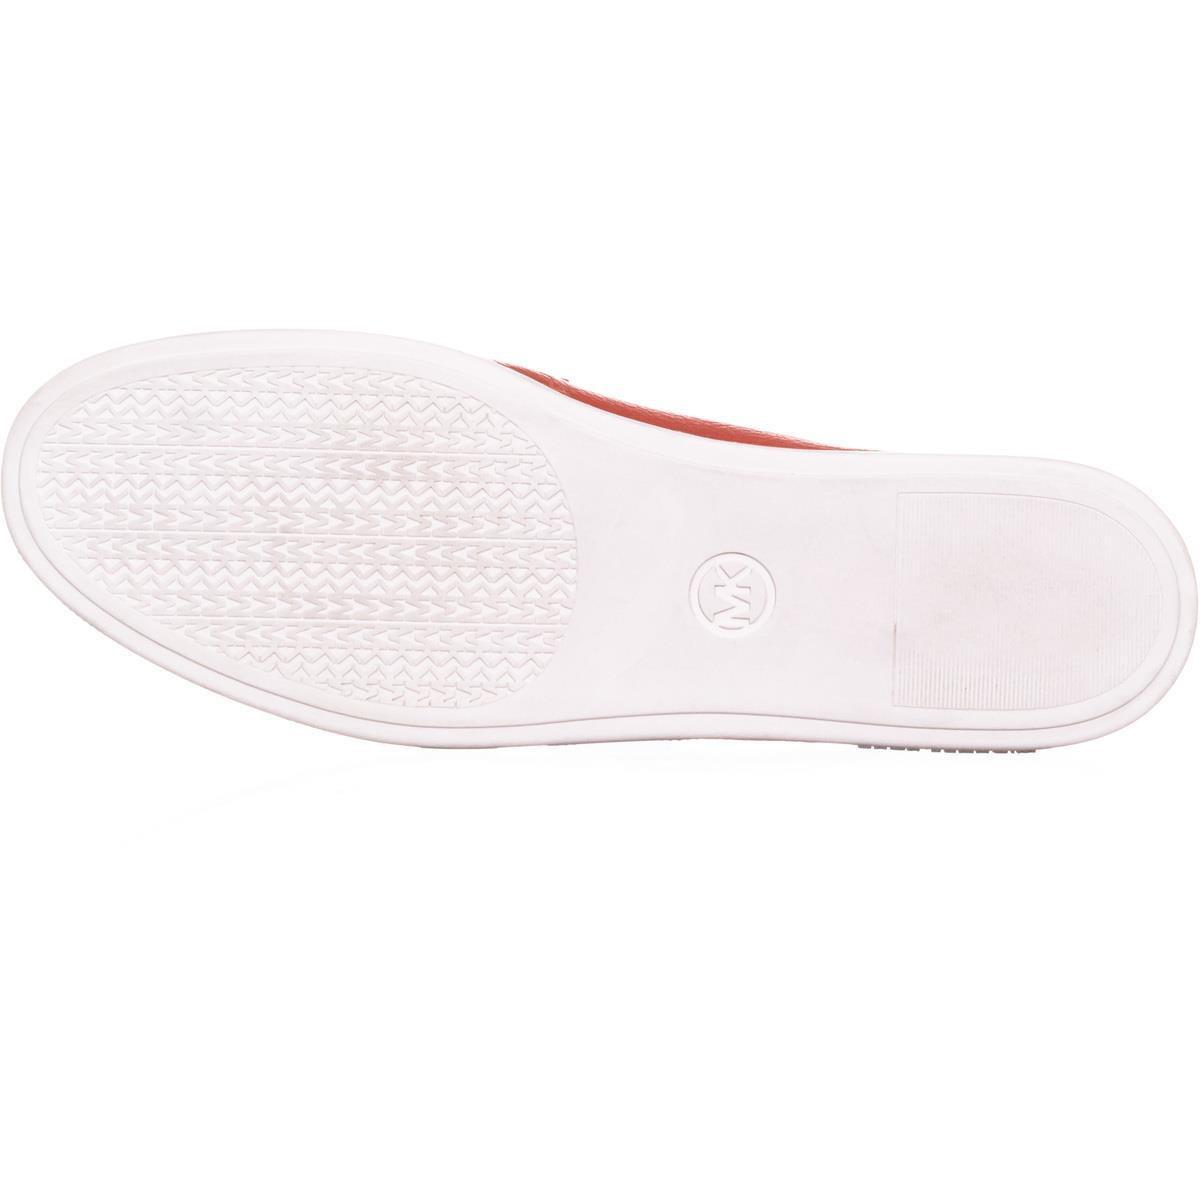 Lyst Michael Kors Callahan Moc Tassel Loafers In Red Clarette Sneakers Clarissa Black Gallery